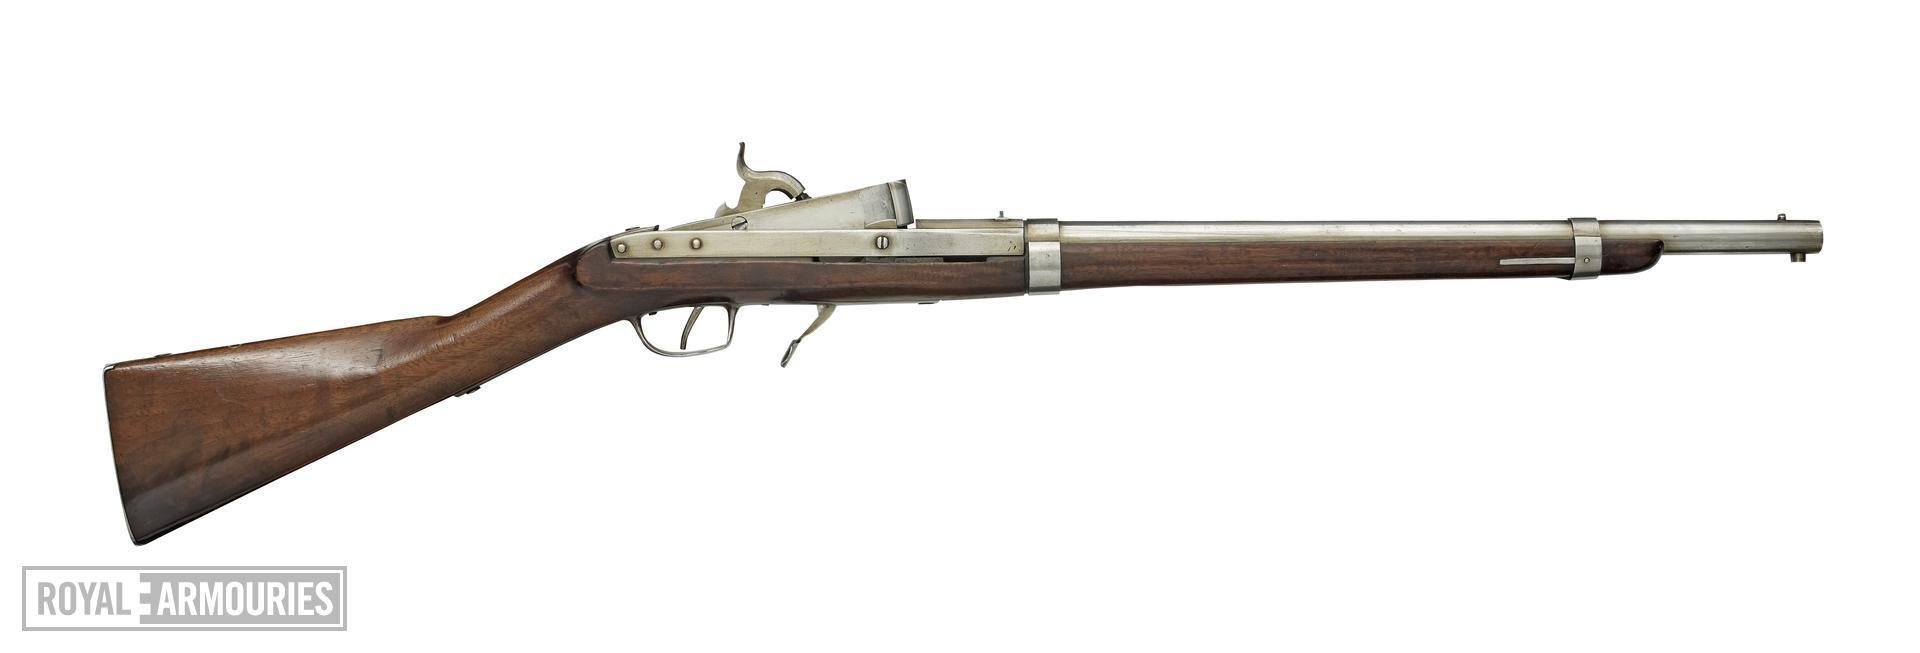 Percussion breech-loading military carbine - Model 1840 Hall Carbine